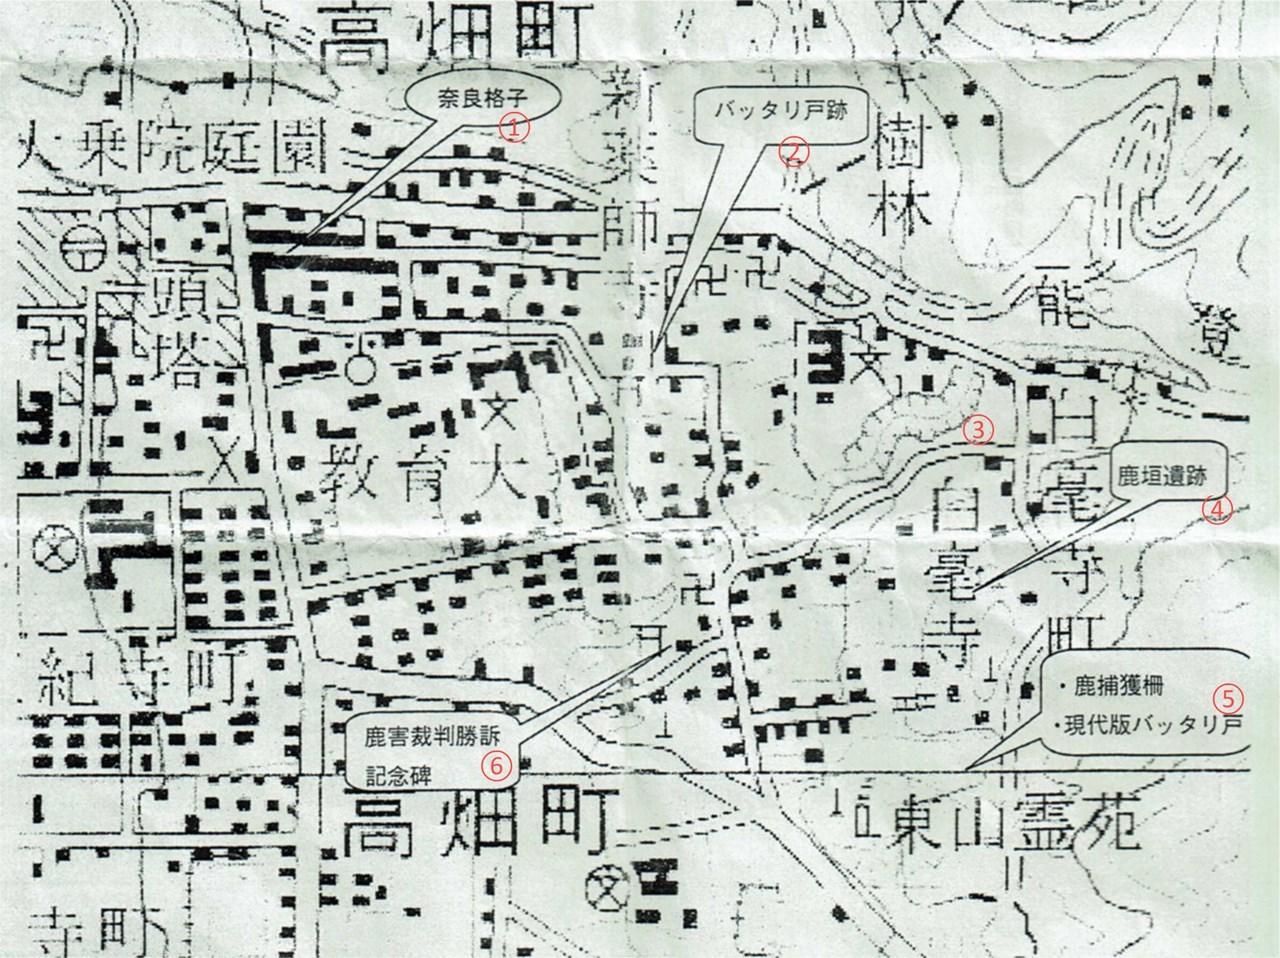 s-鹿垣地図Ⅱ